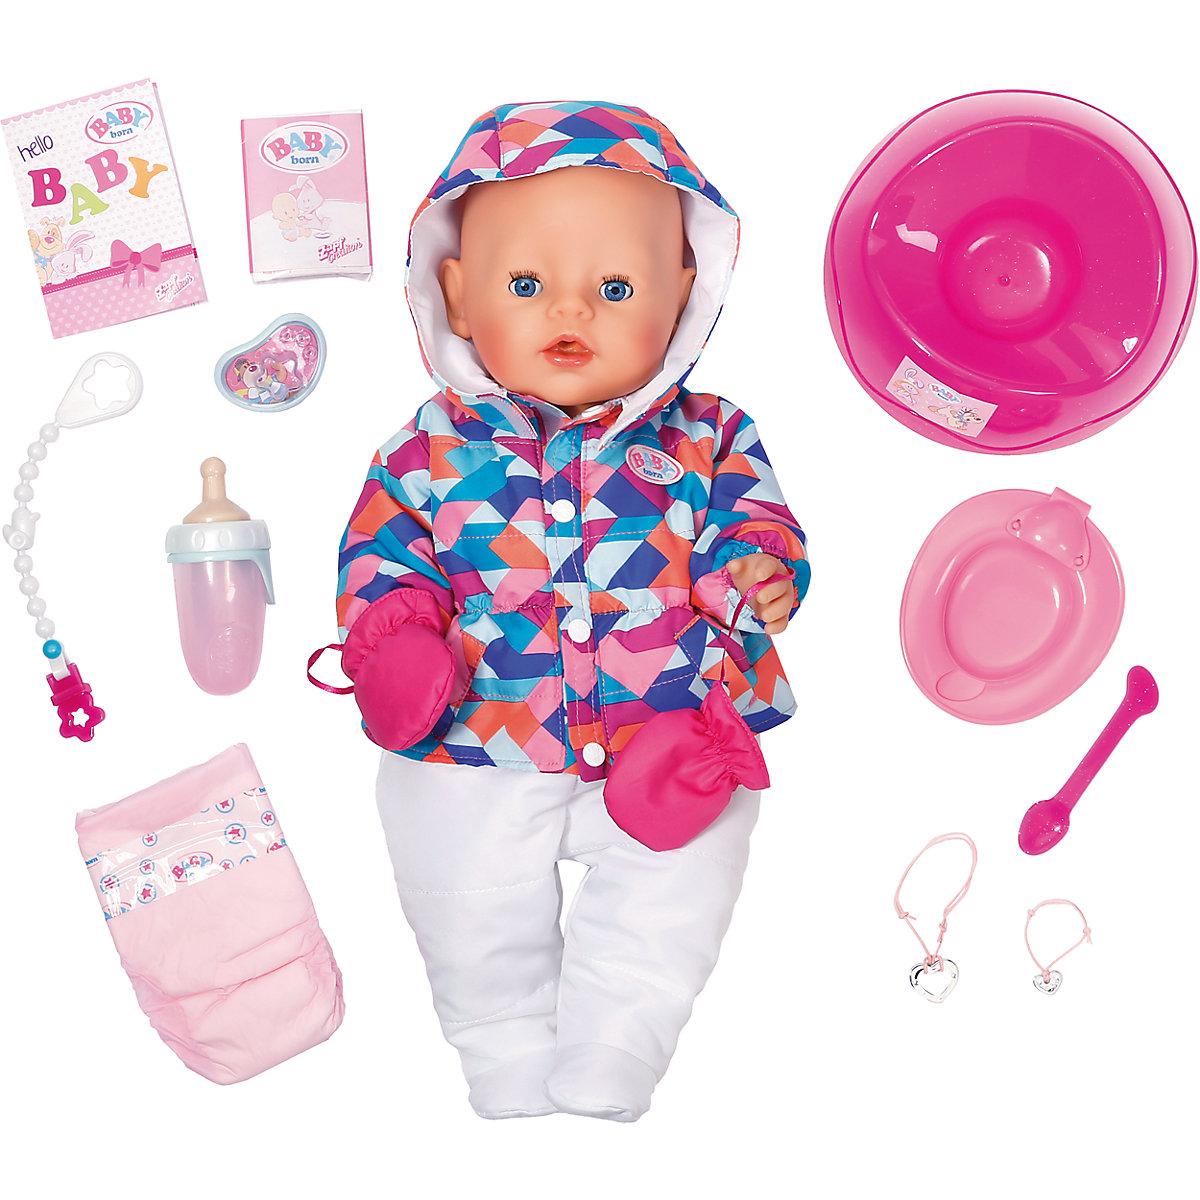 Zapf Creation EXKLUSIV BABY born Zimní set